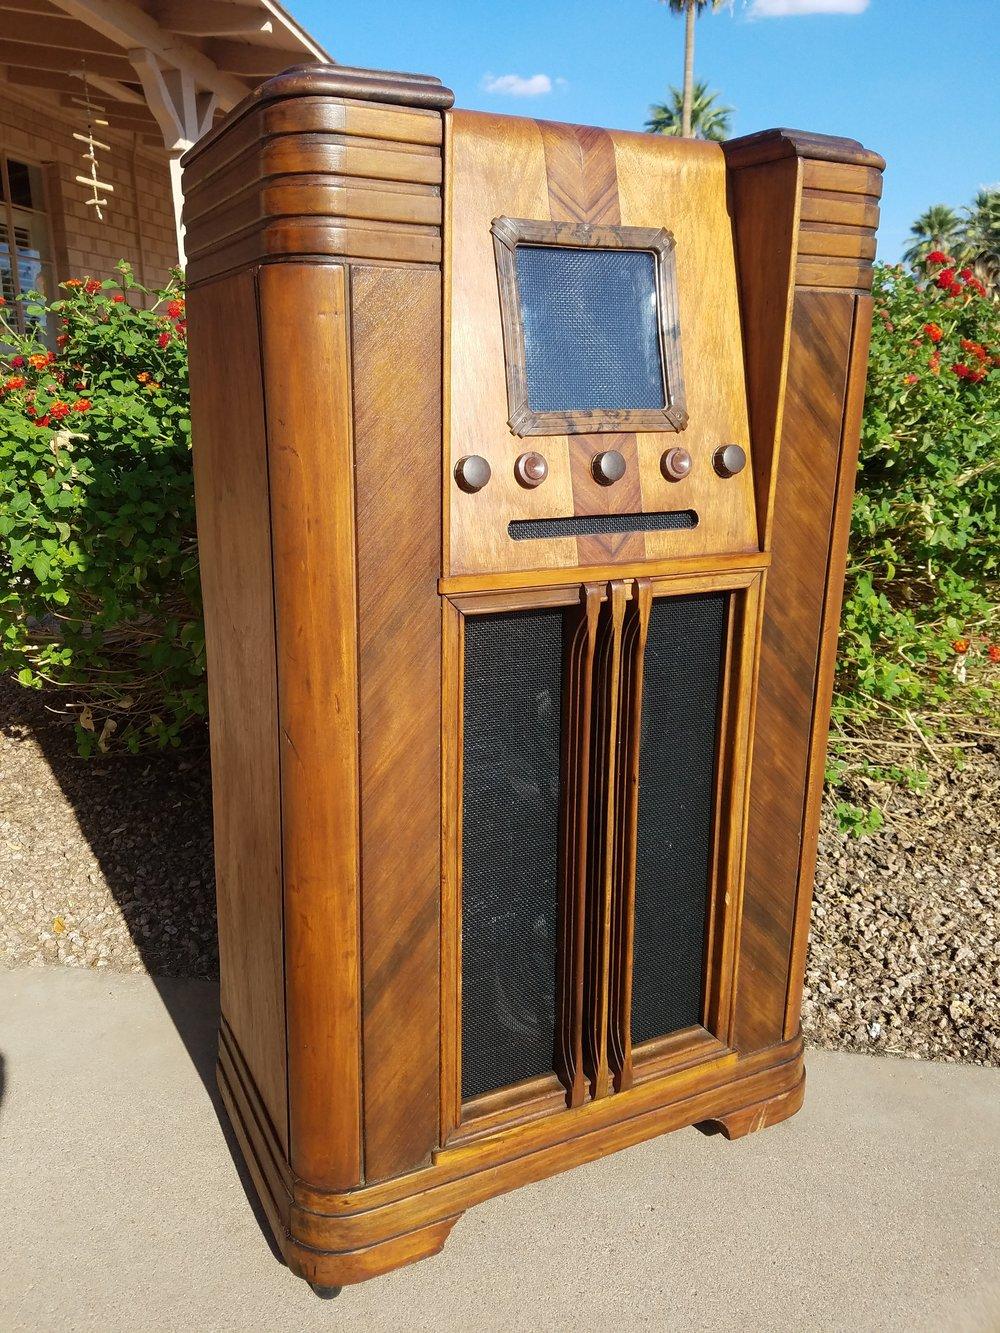 Western Air Patrol Antique Radio Cabinet Now IPod/MP3 Player! Vintage  Original Finish